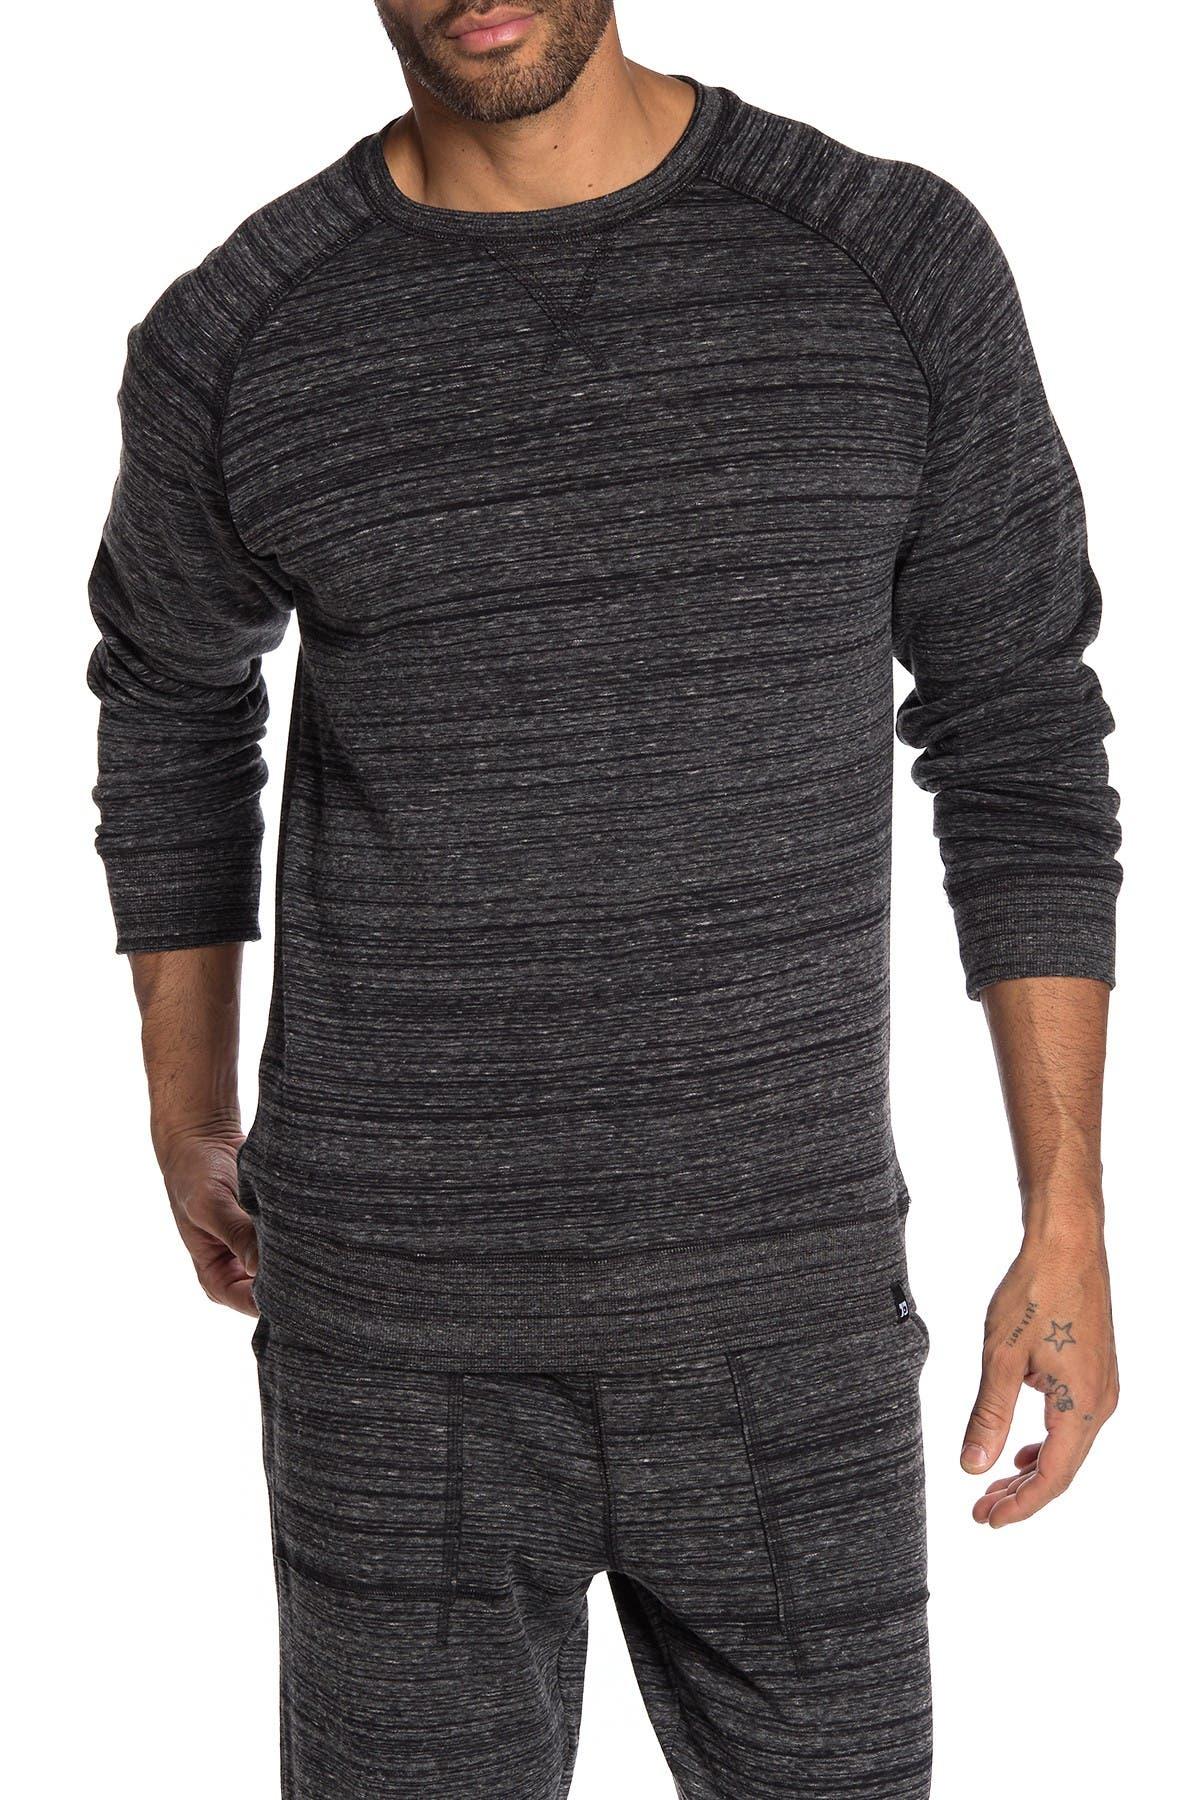 Image of Joe's Jeans Faux Nouveau Raglan Sweatshirt